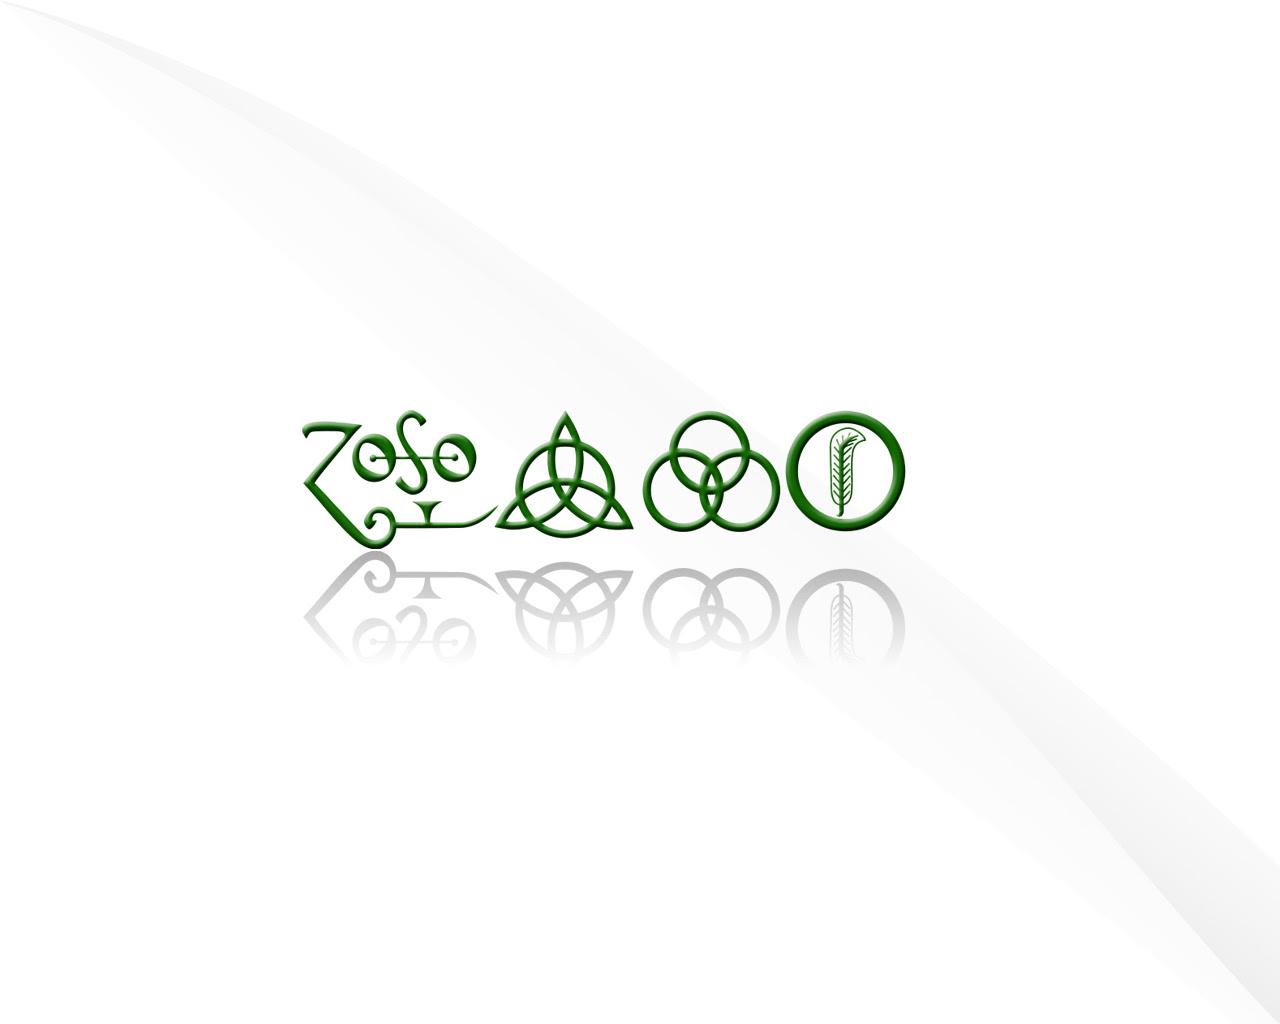 65 Led Zeppelin Meaning Of Symbols Led Zeppelin Of Symbols Meaning